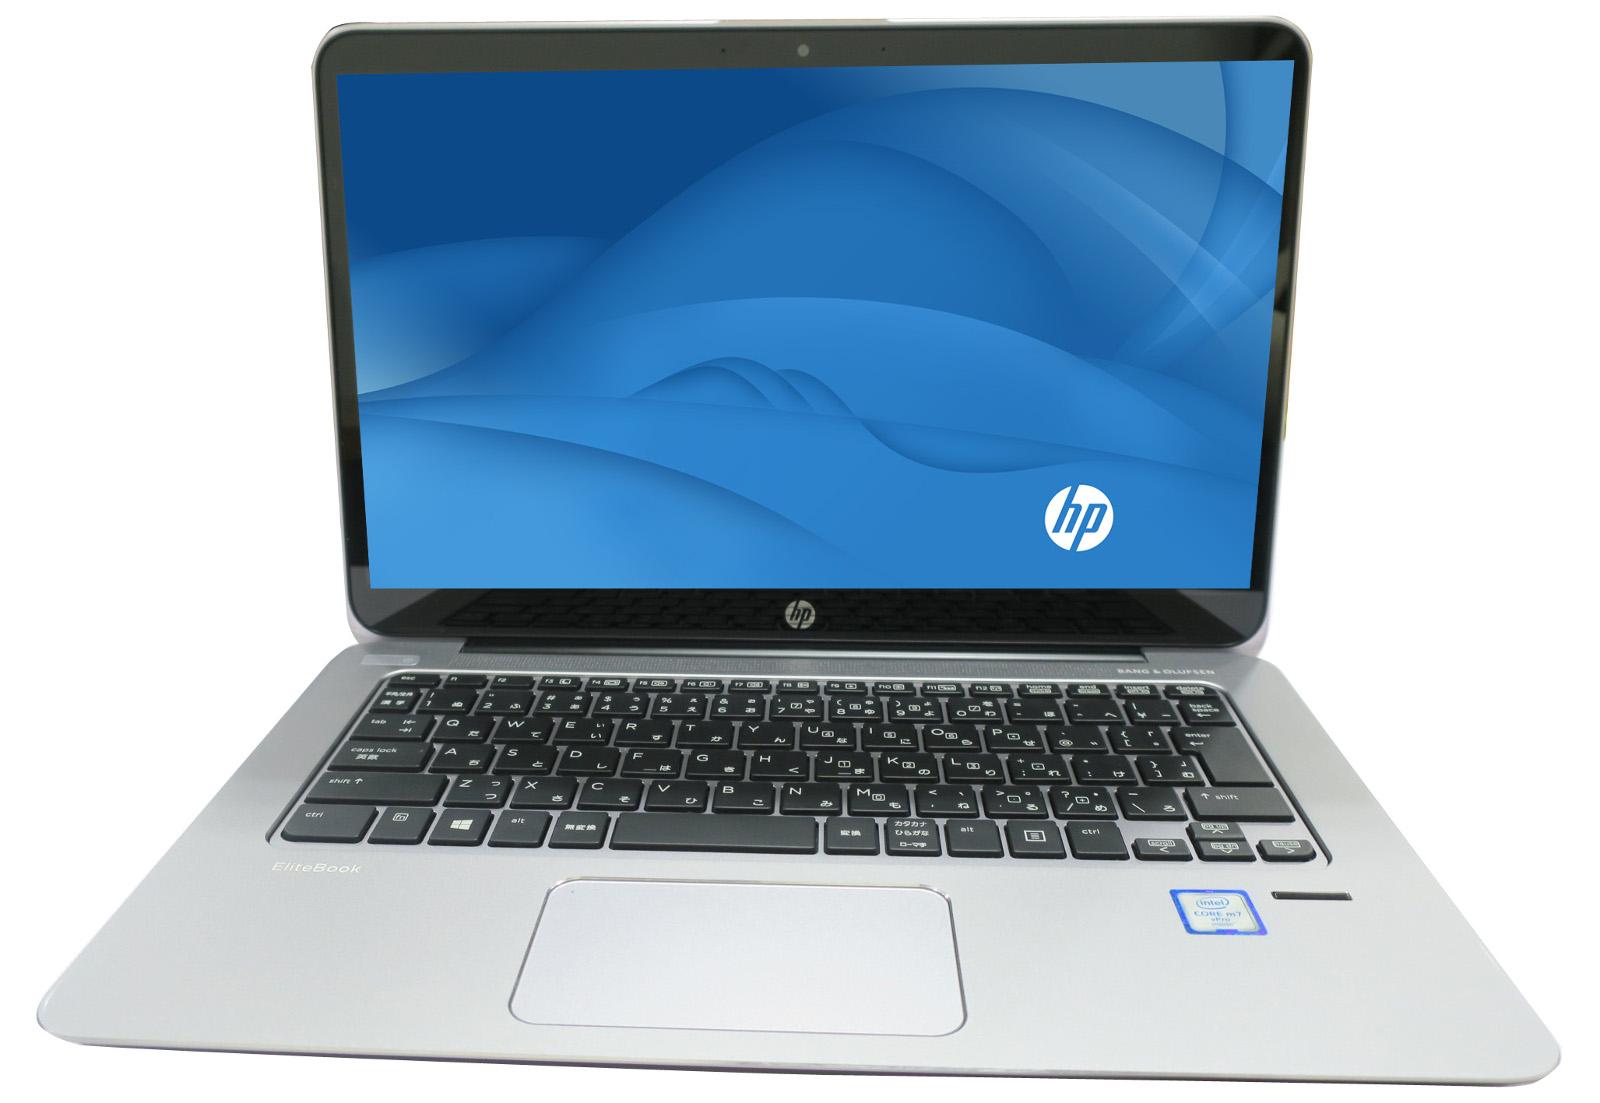 Core M5 6Y54 1.1GHz 8GB SSD:256GB Win10 Pro 64bit 商品ランク:B HP 中古 X3E62PA 中古ノートパソコンHP 動作ランク:B EliteBook 1030 無償保証6ヶ月 格安 価格でご提供いたします 中古ノートパソコンCore 正規逆輸入品 G1